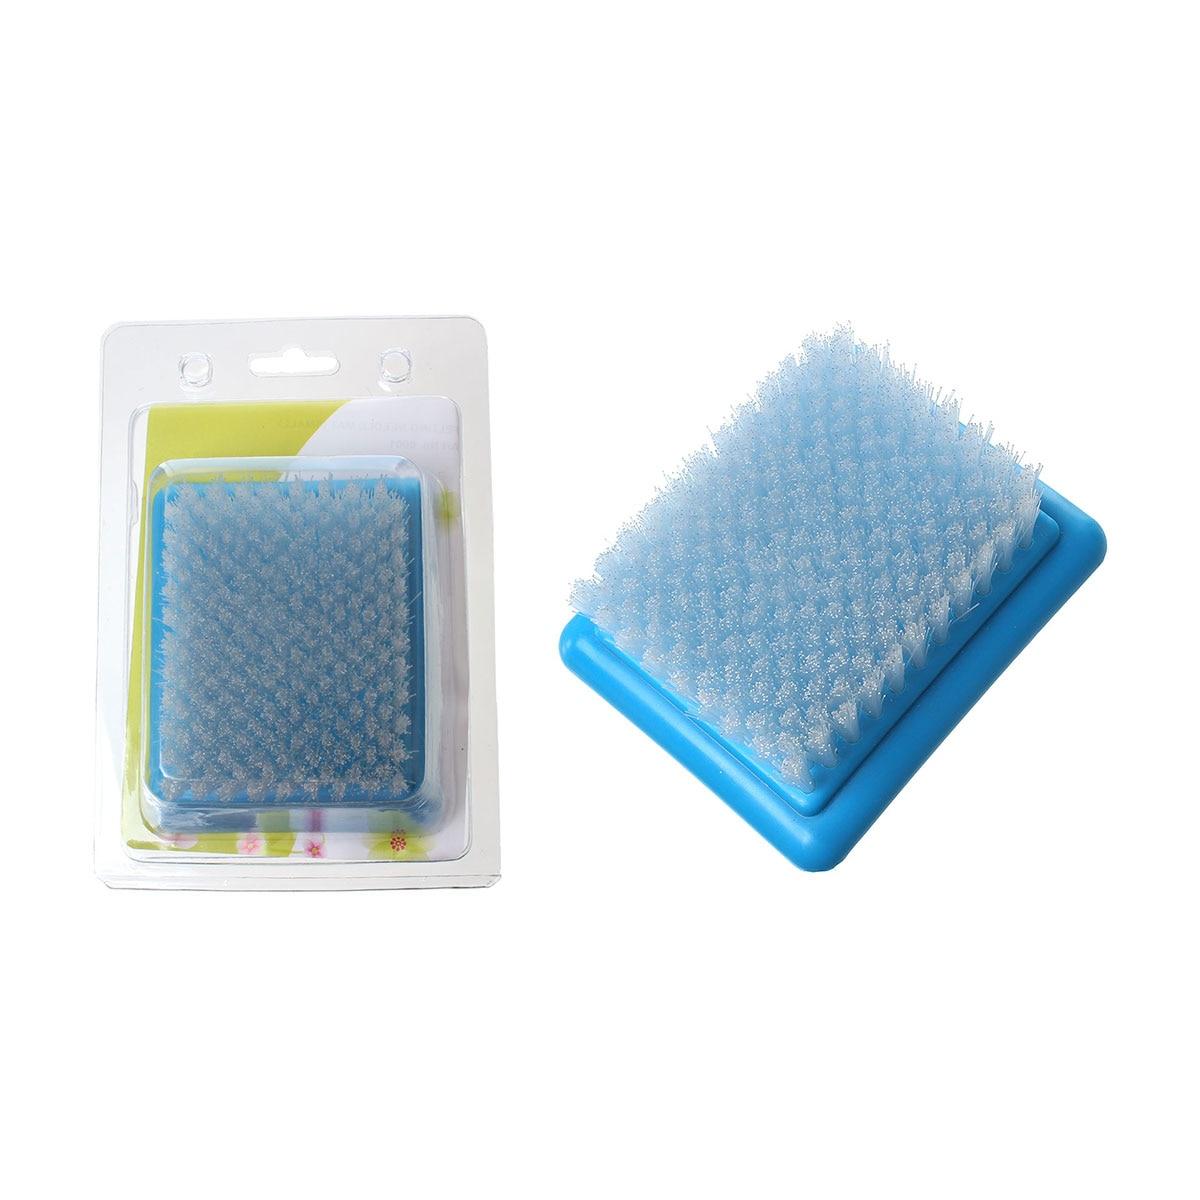 Polypropylene Felting Needle Mat Brush For Large Embroidery Stitching Punch Craft Tool Blue 1 PC